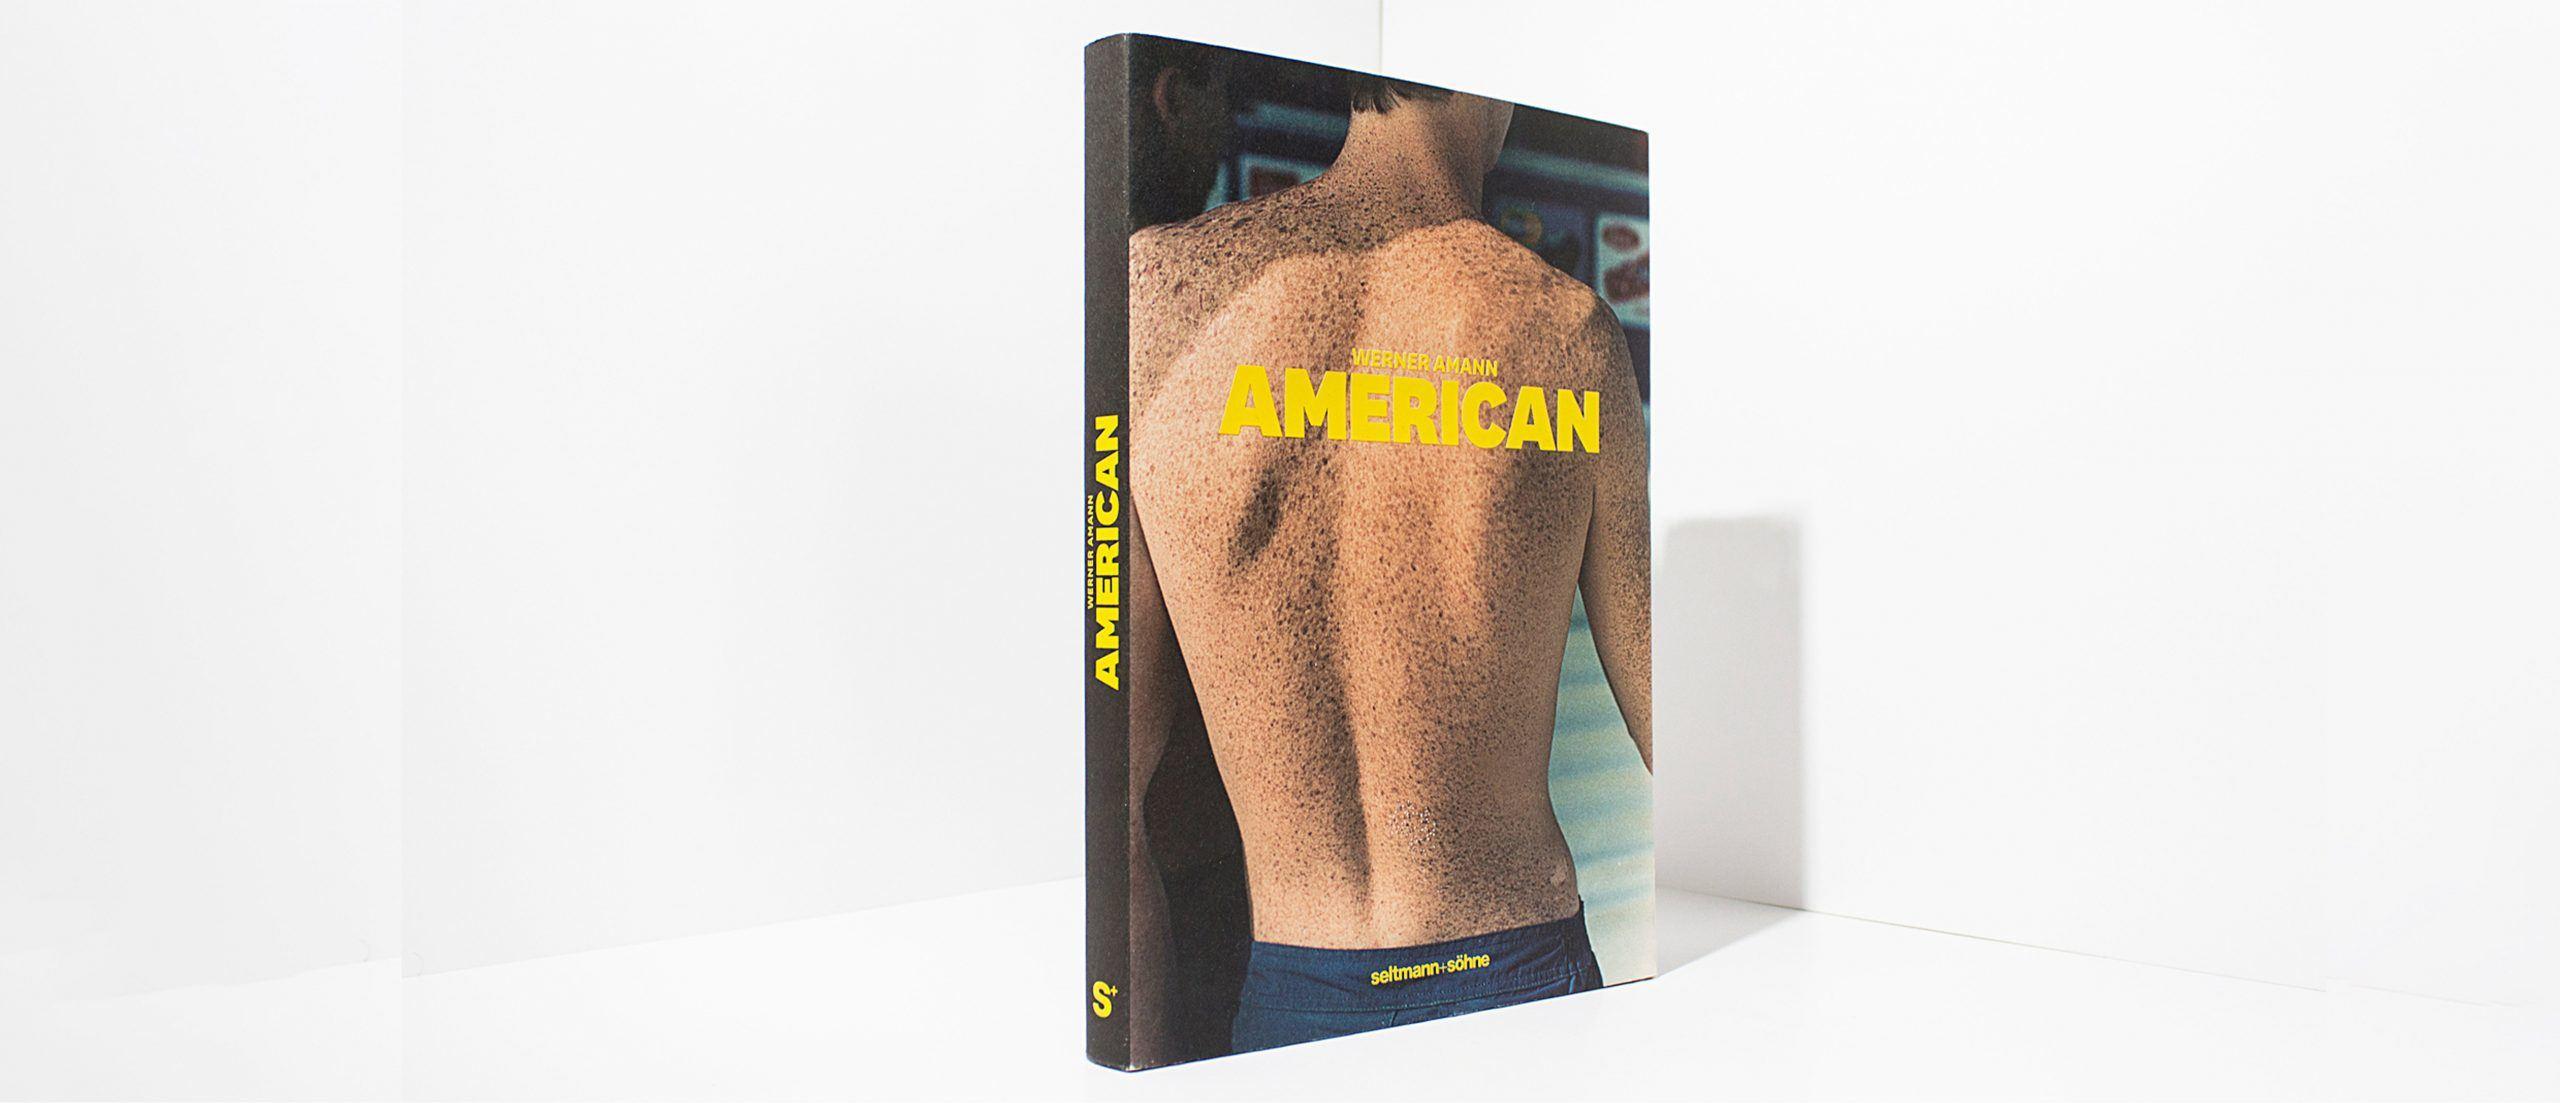 Studio Last - American – Werner Amann – Book